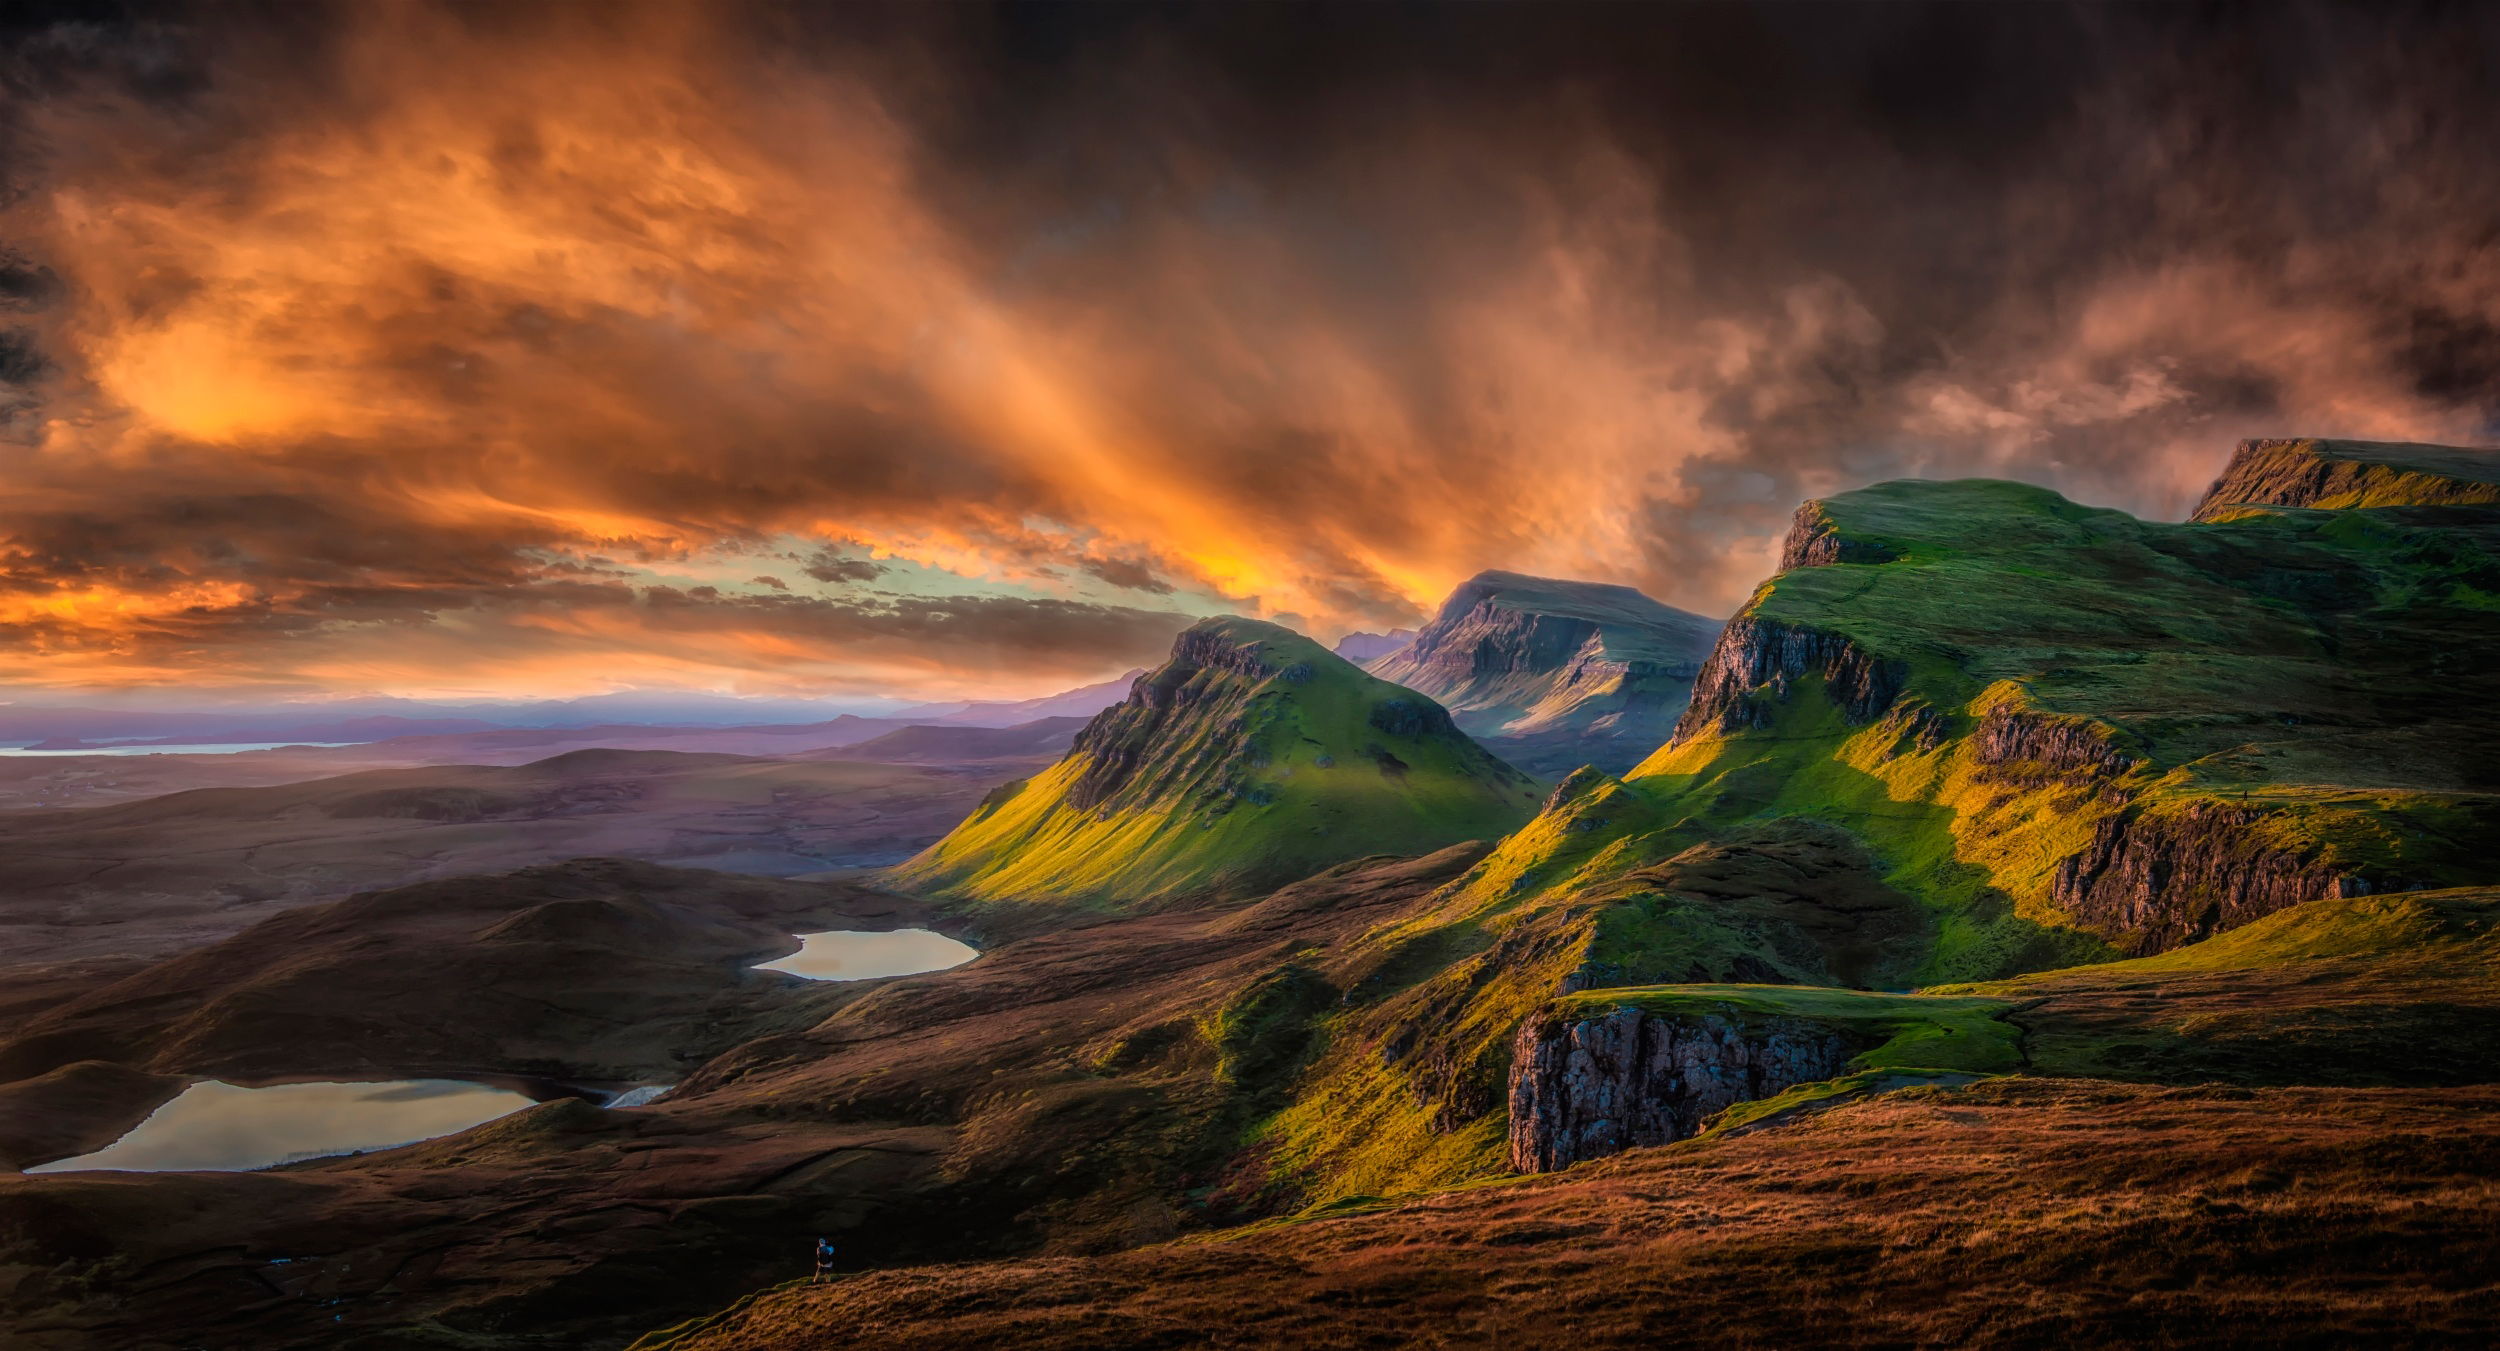 скалы горы закат  № 371366 загрузить